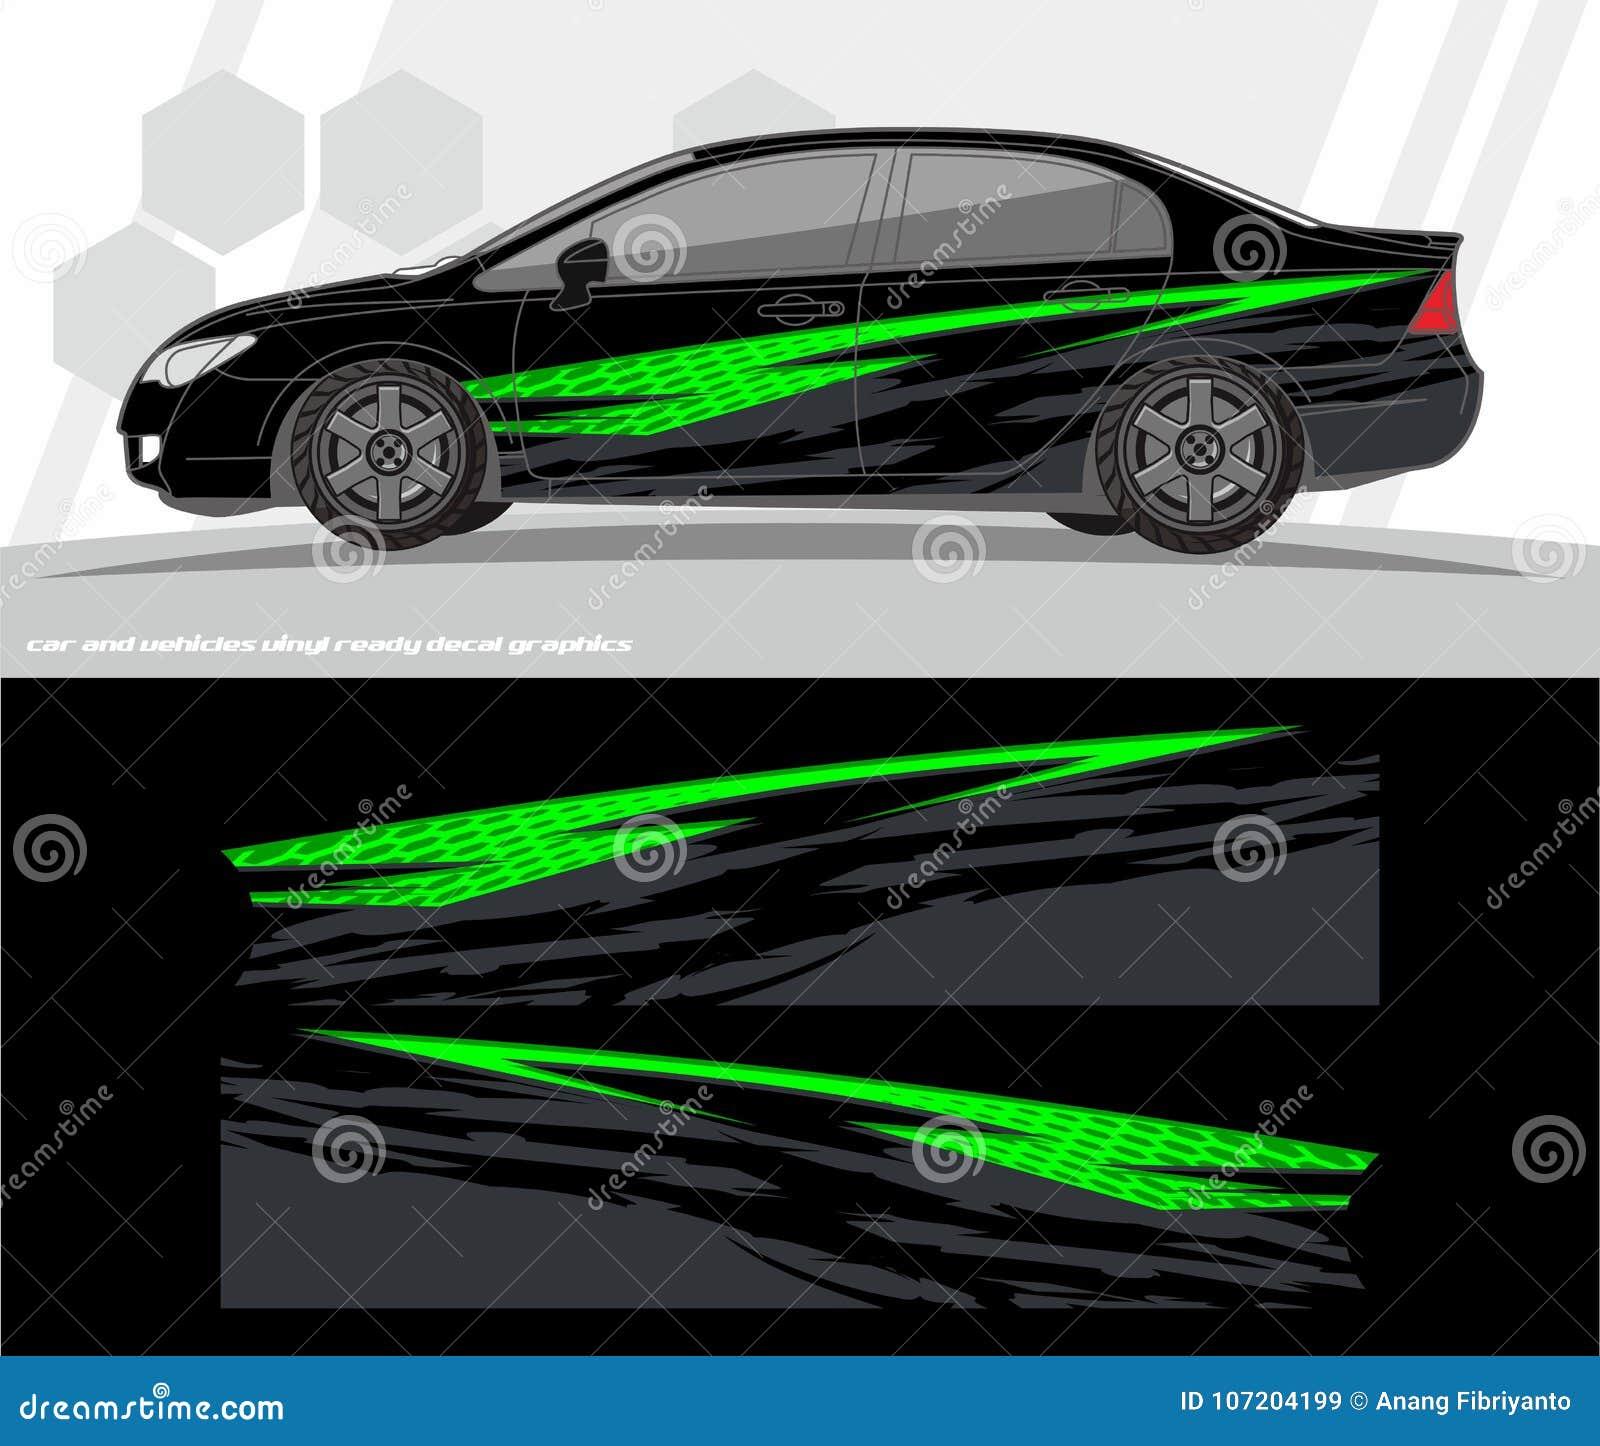 Professional modern car bike vehicle graphics vinyls wrap decals kit vector graphic kit